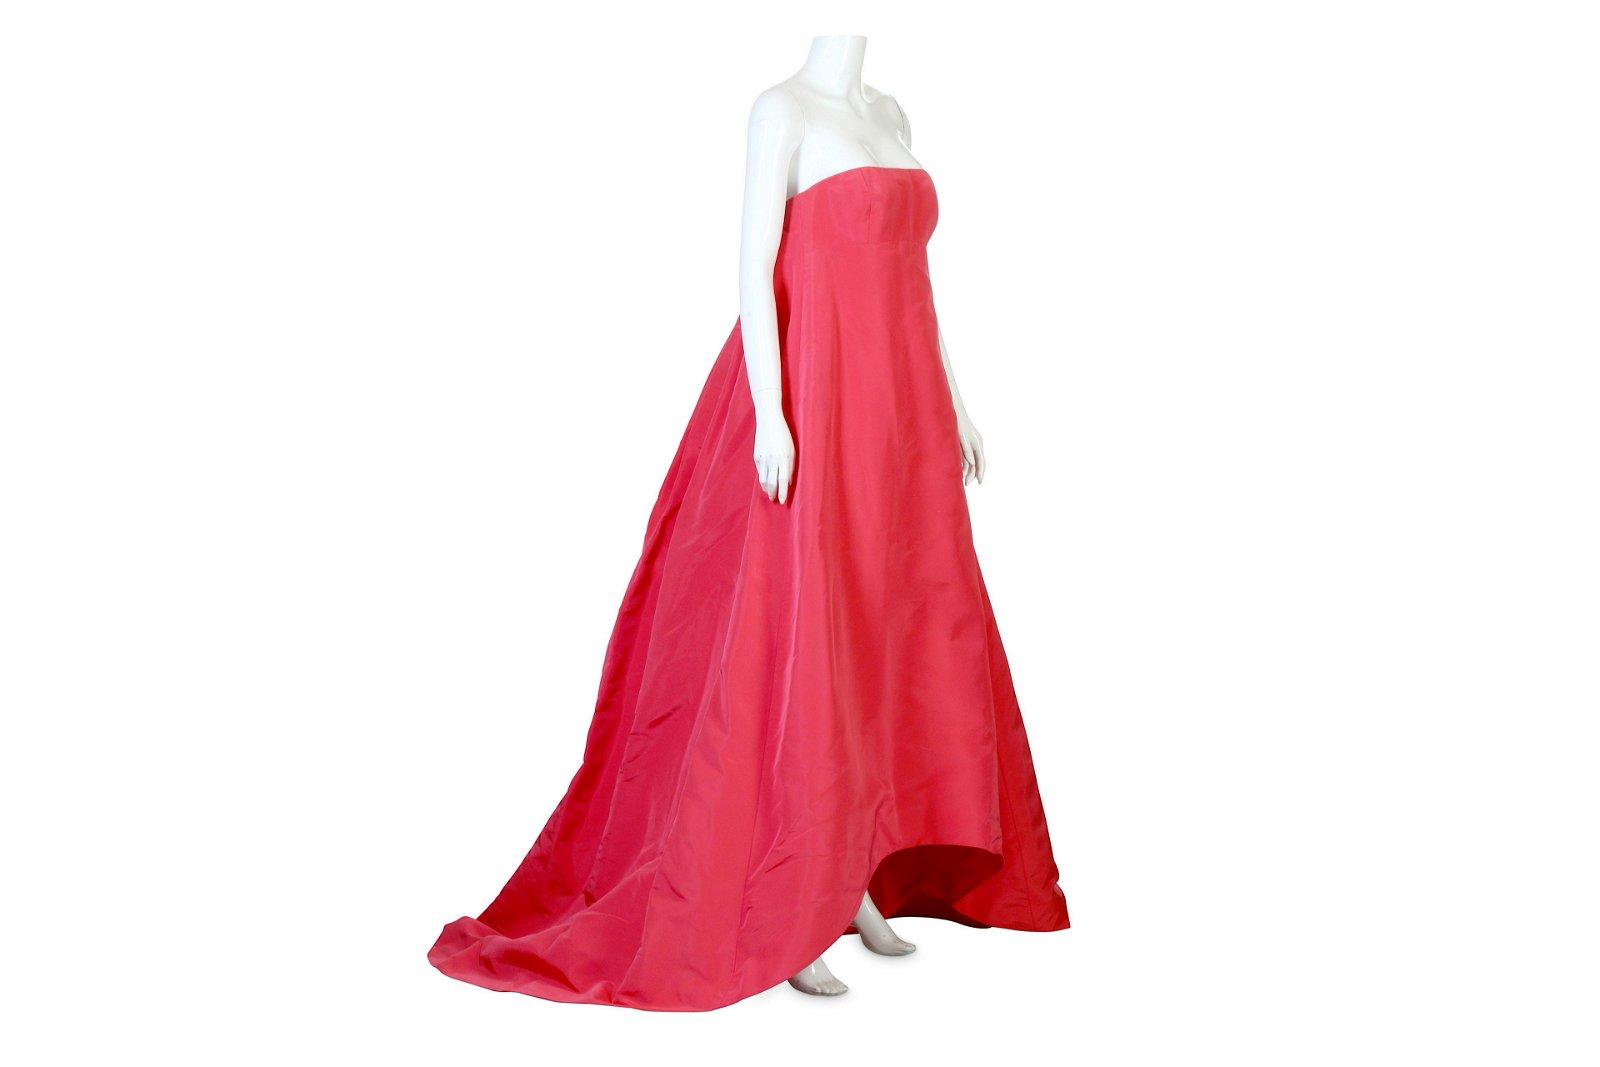 Oscar de la Renta Pink Silk Ball Gown